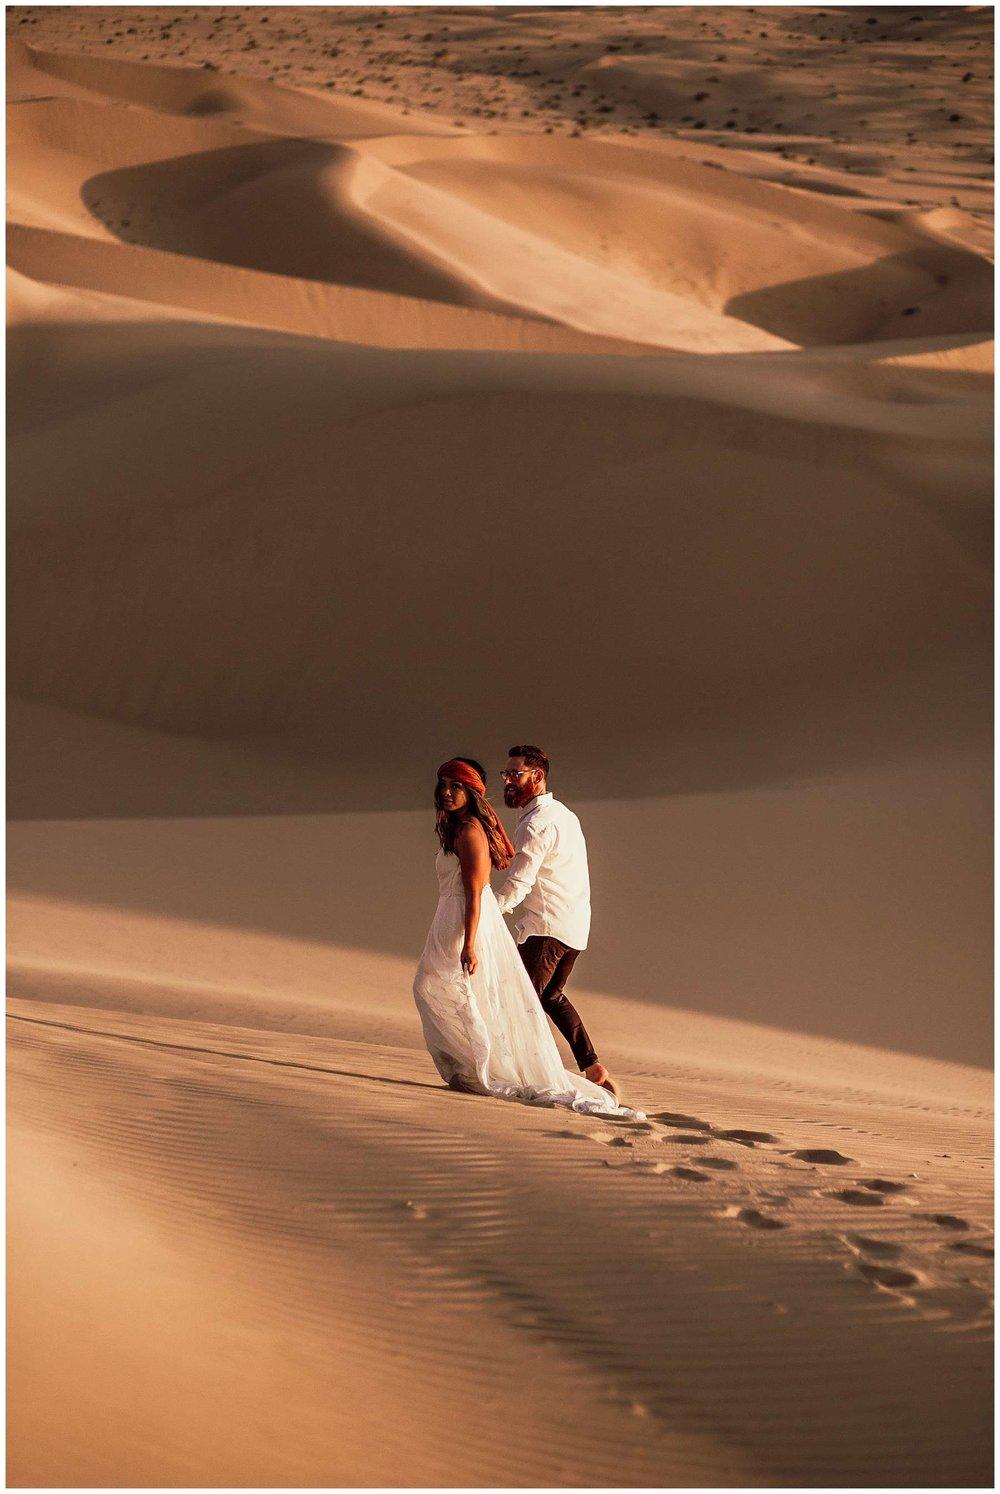 LOTTYH-Morocco-adventure-elopement_0002.jpg